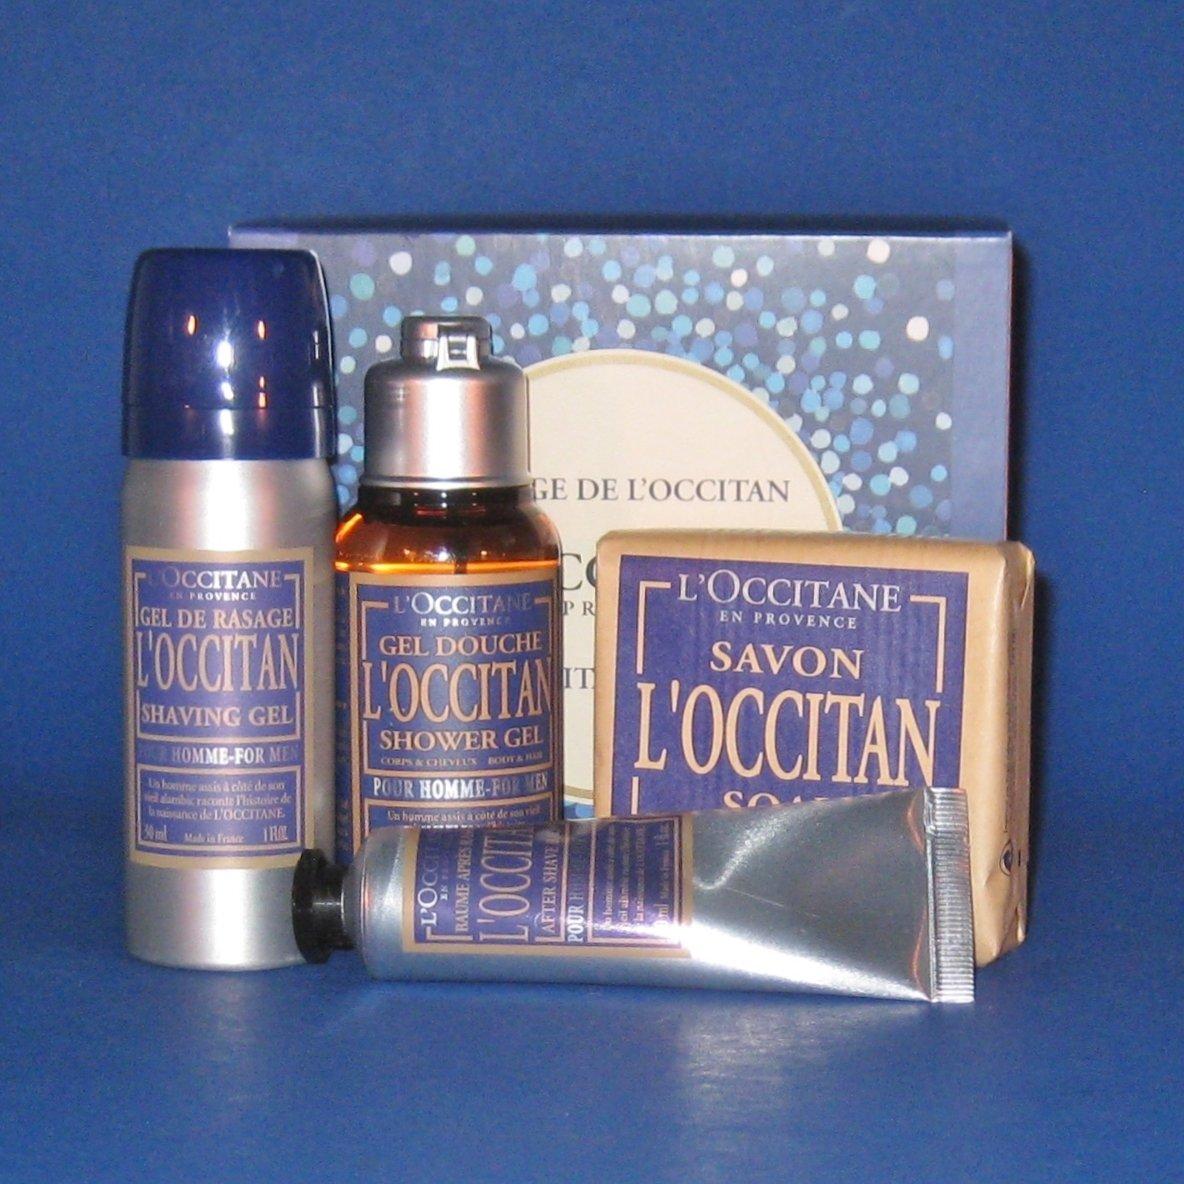 NIB L'Occitane 4-Piece L'Occitan Men's Por Homme Travel Gift Set